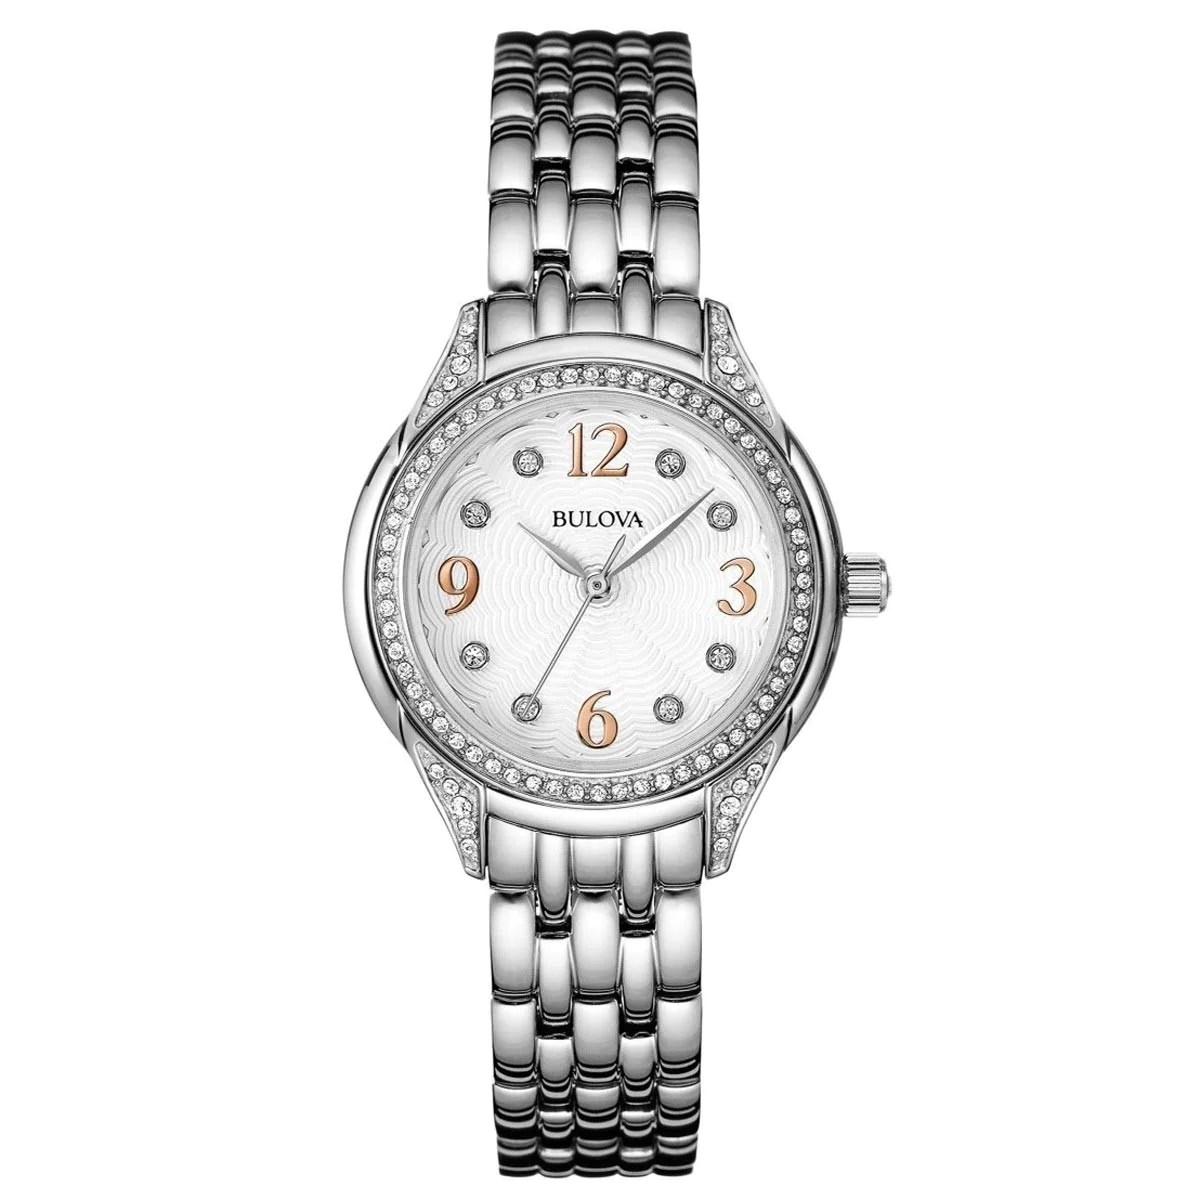 Bulova 96L212 Lady's Crystal White Dial Steel Bracelet Watch